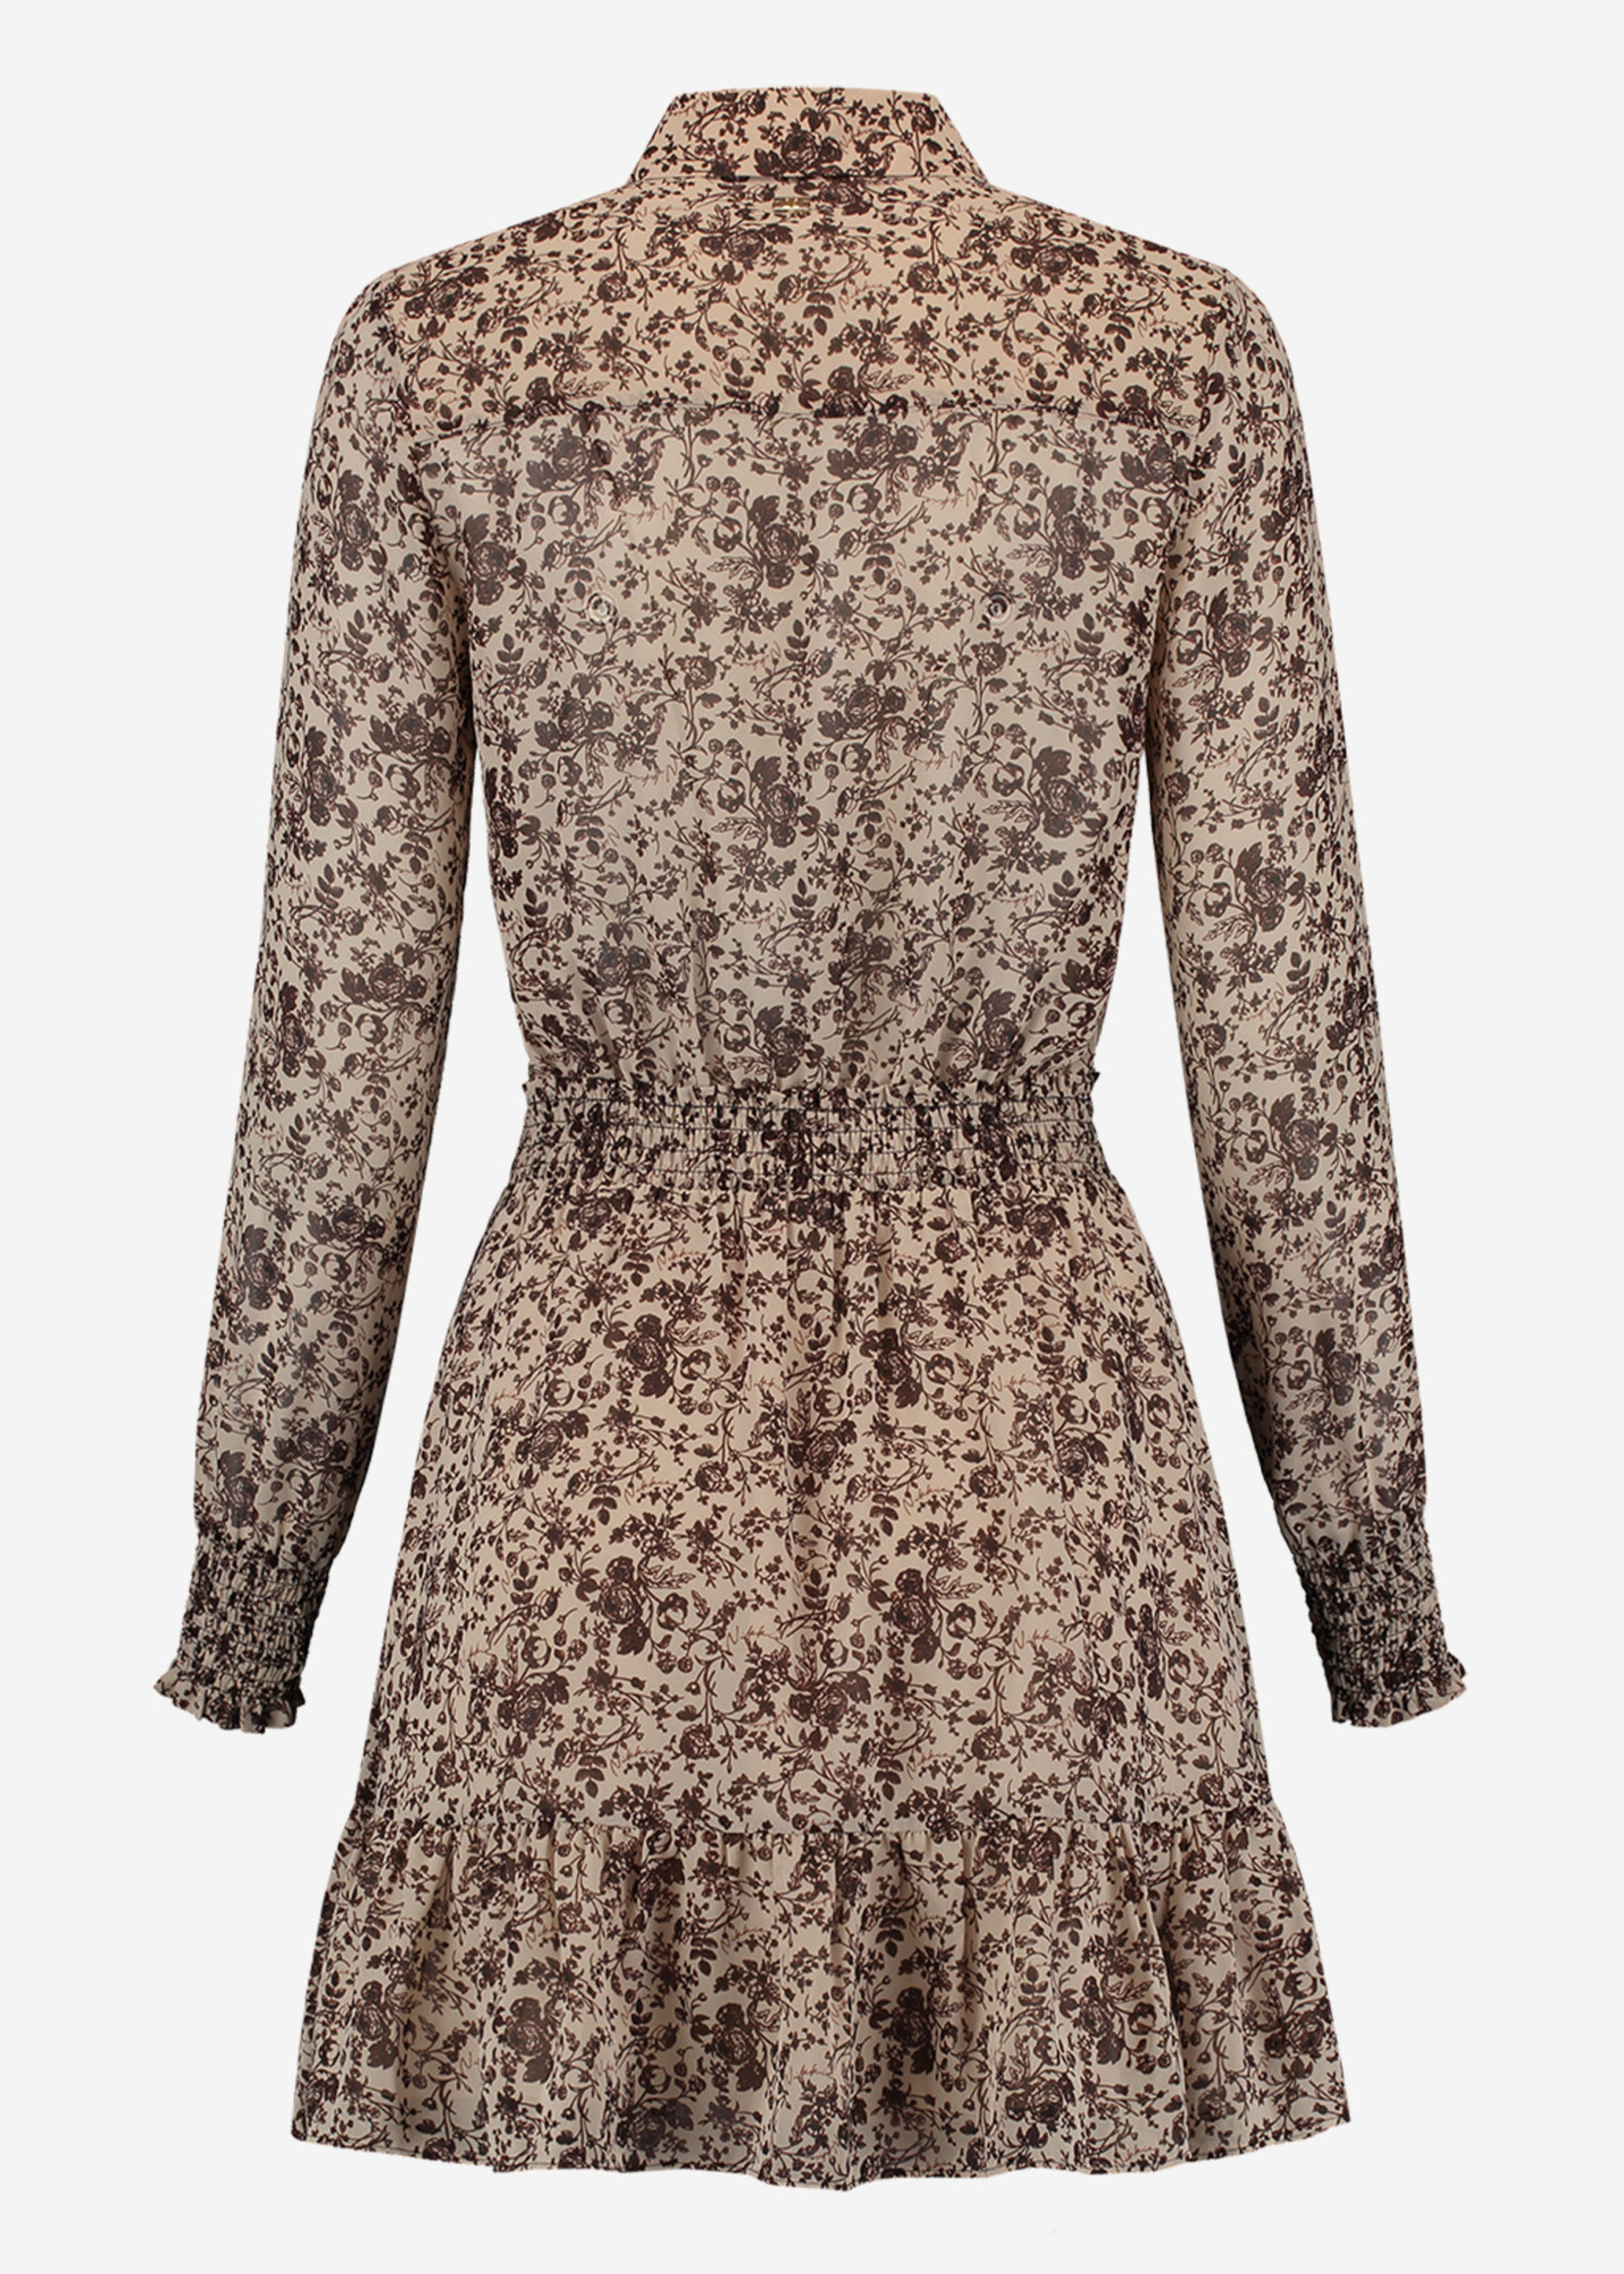 NIKKIE FLOWER DUSTY DRESS jurk met bloemenprint